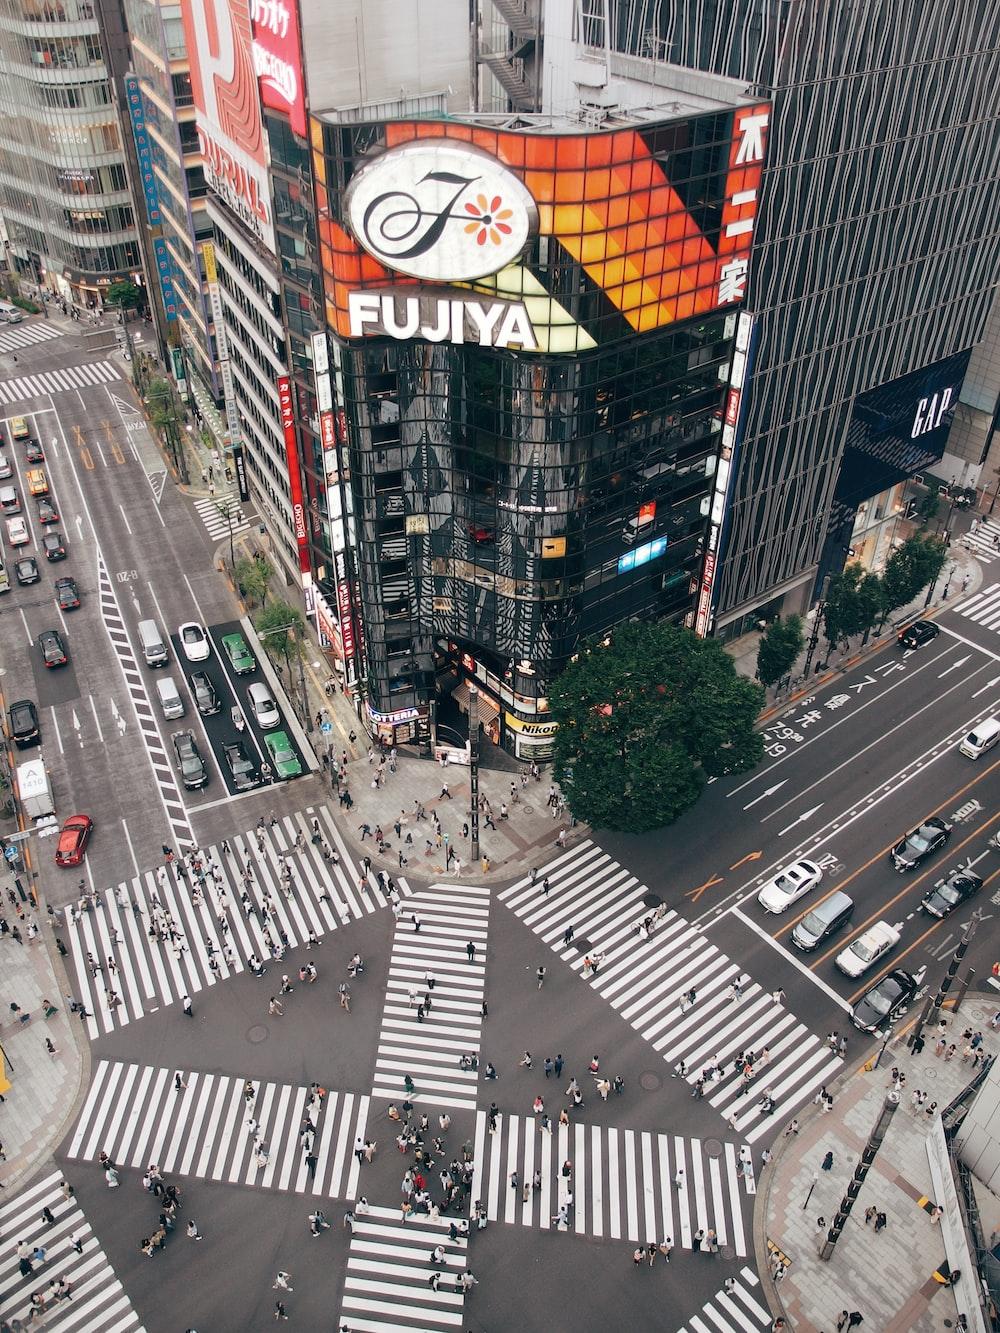 aerial view photography of Fujiya building